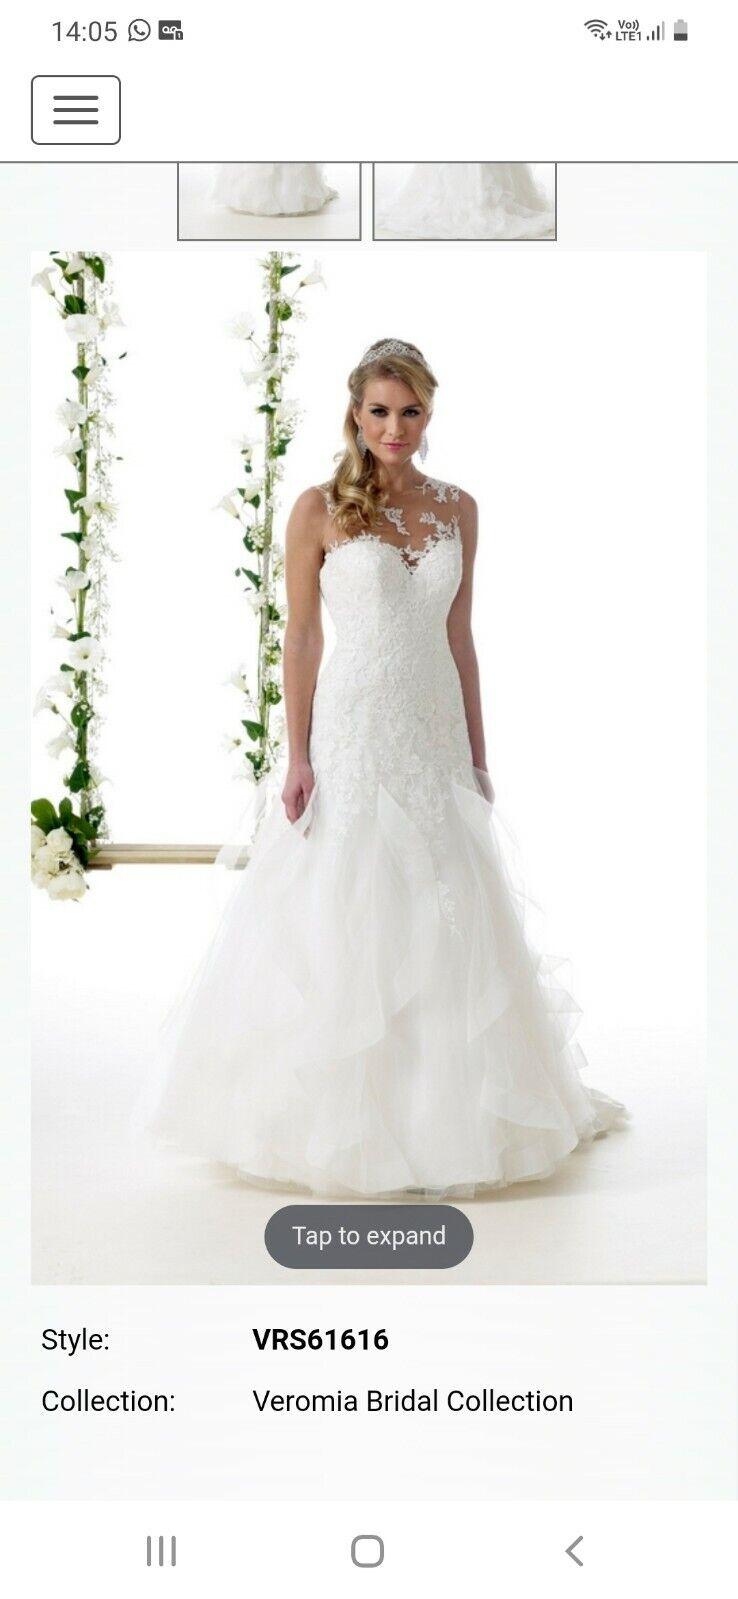 Veromia wedding dress size 12